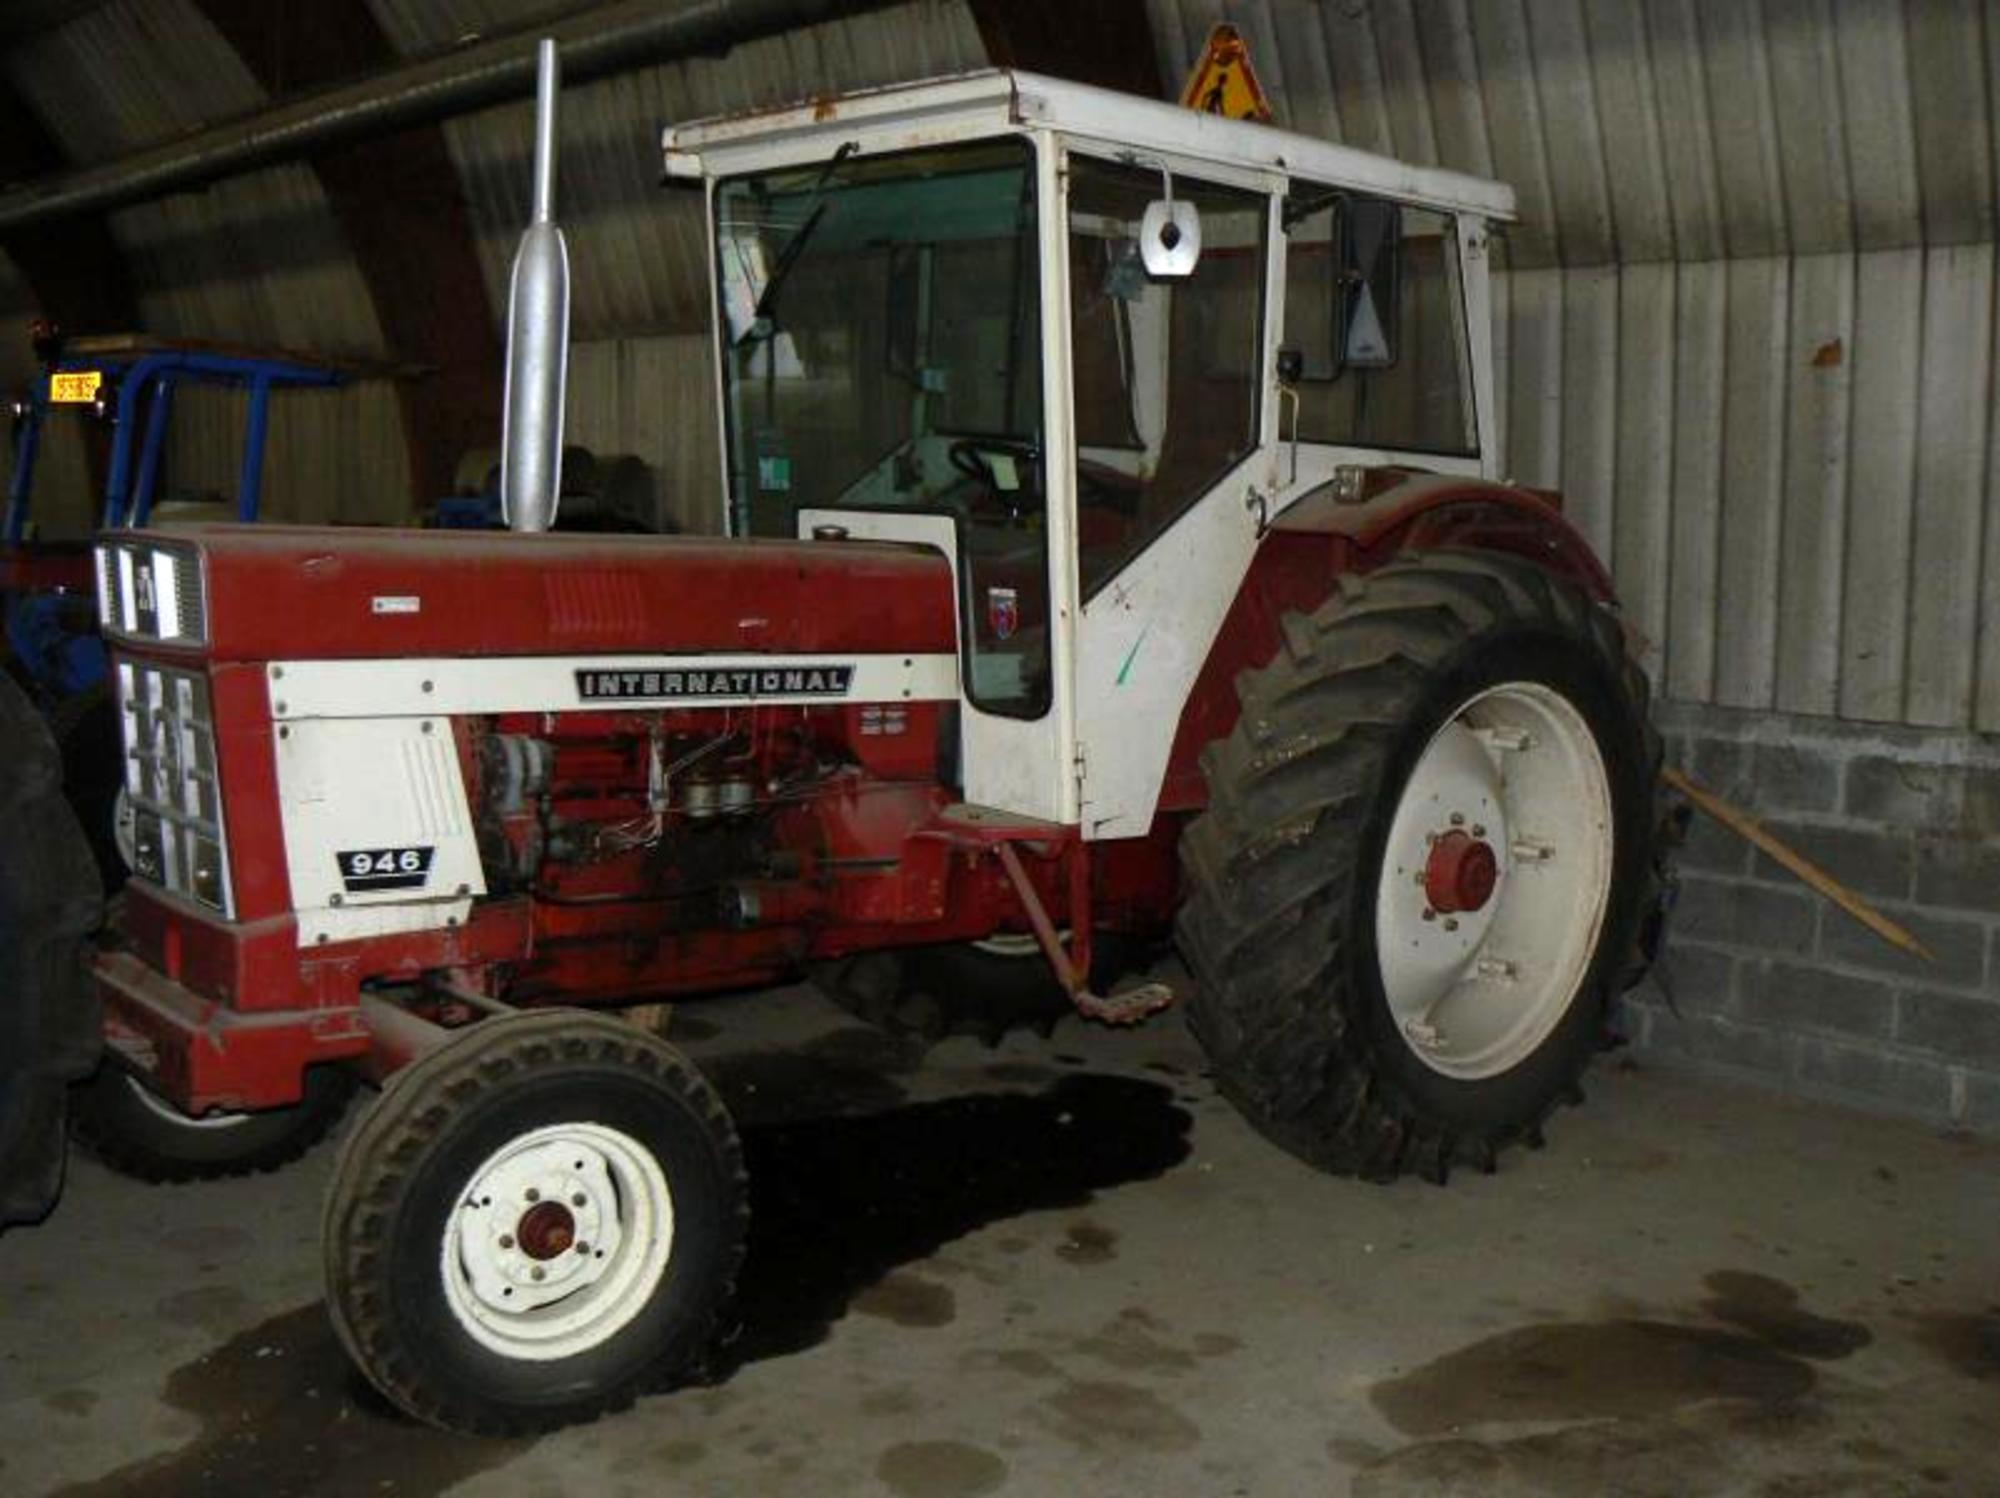 tracteur international 946 tracteur d 39 occasion aux ench res agorastore. Black Bedroom Furniture Sets. Home Design Ideas